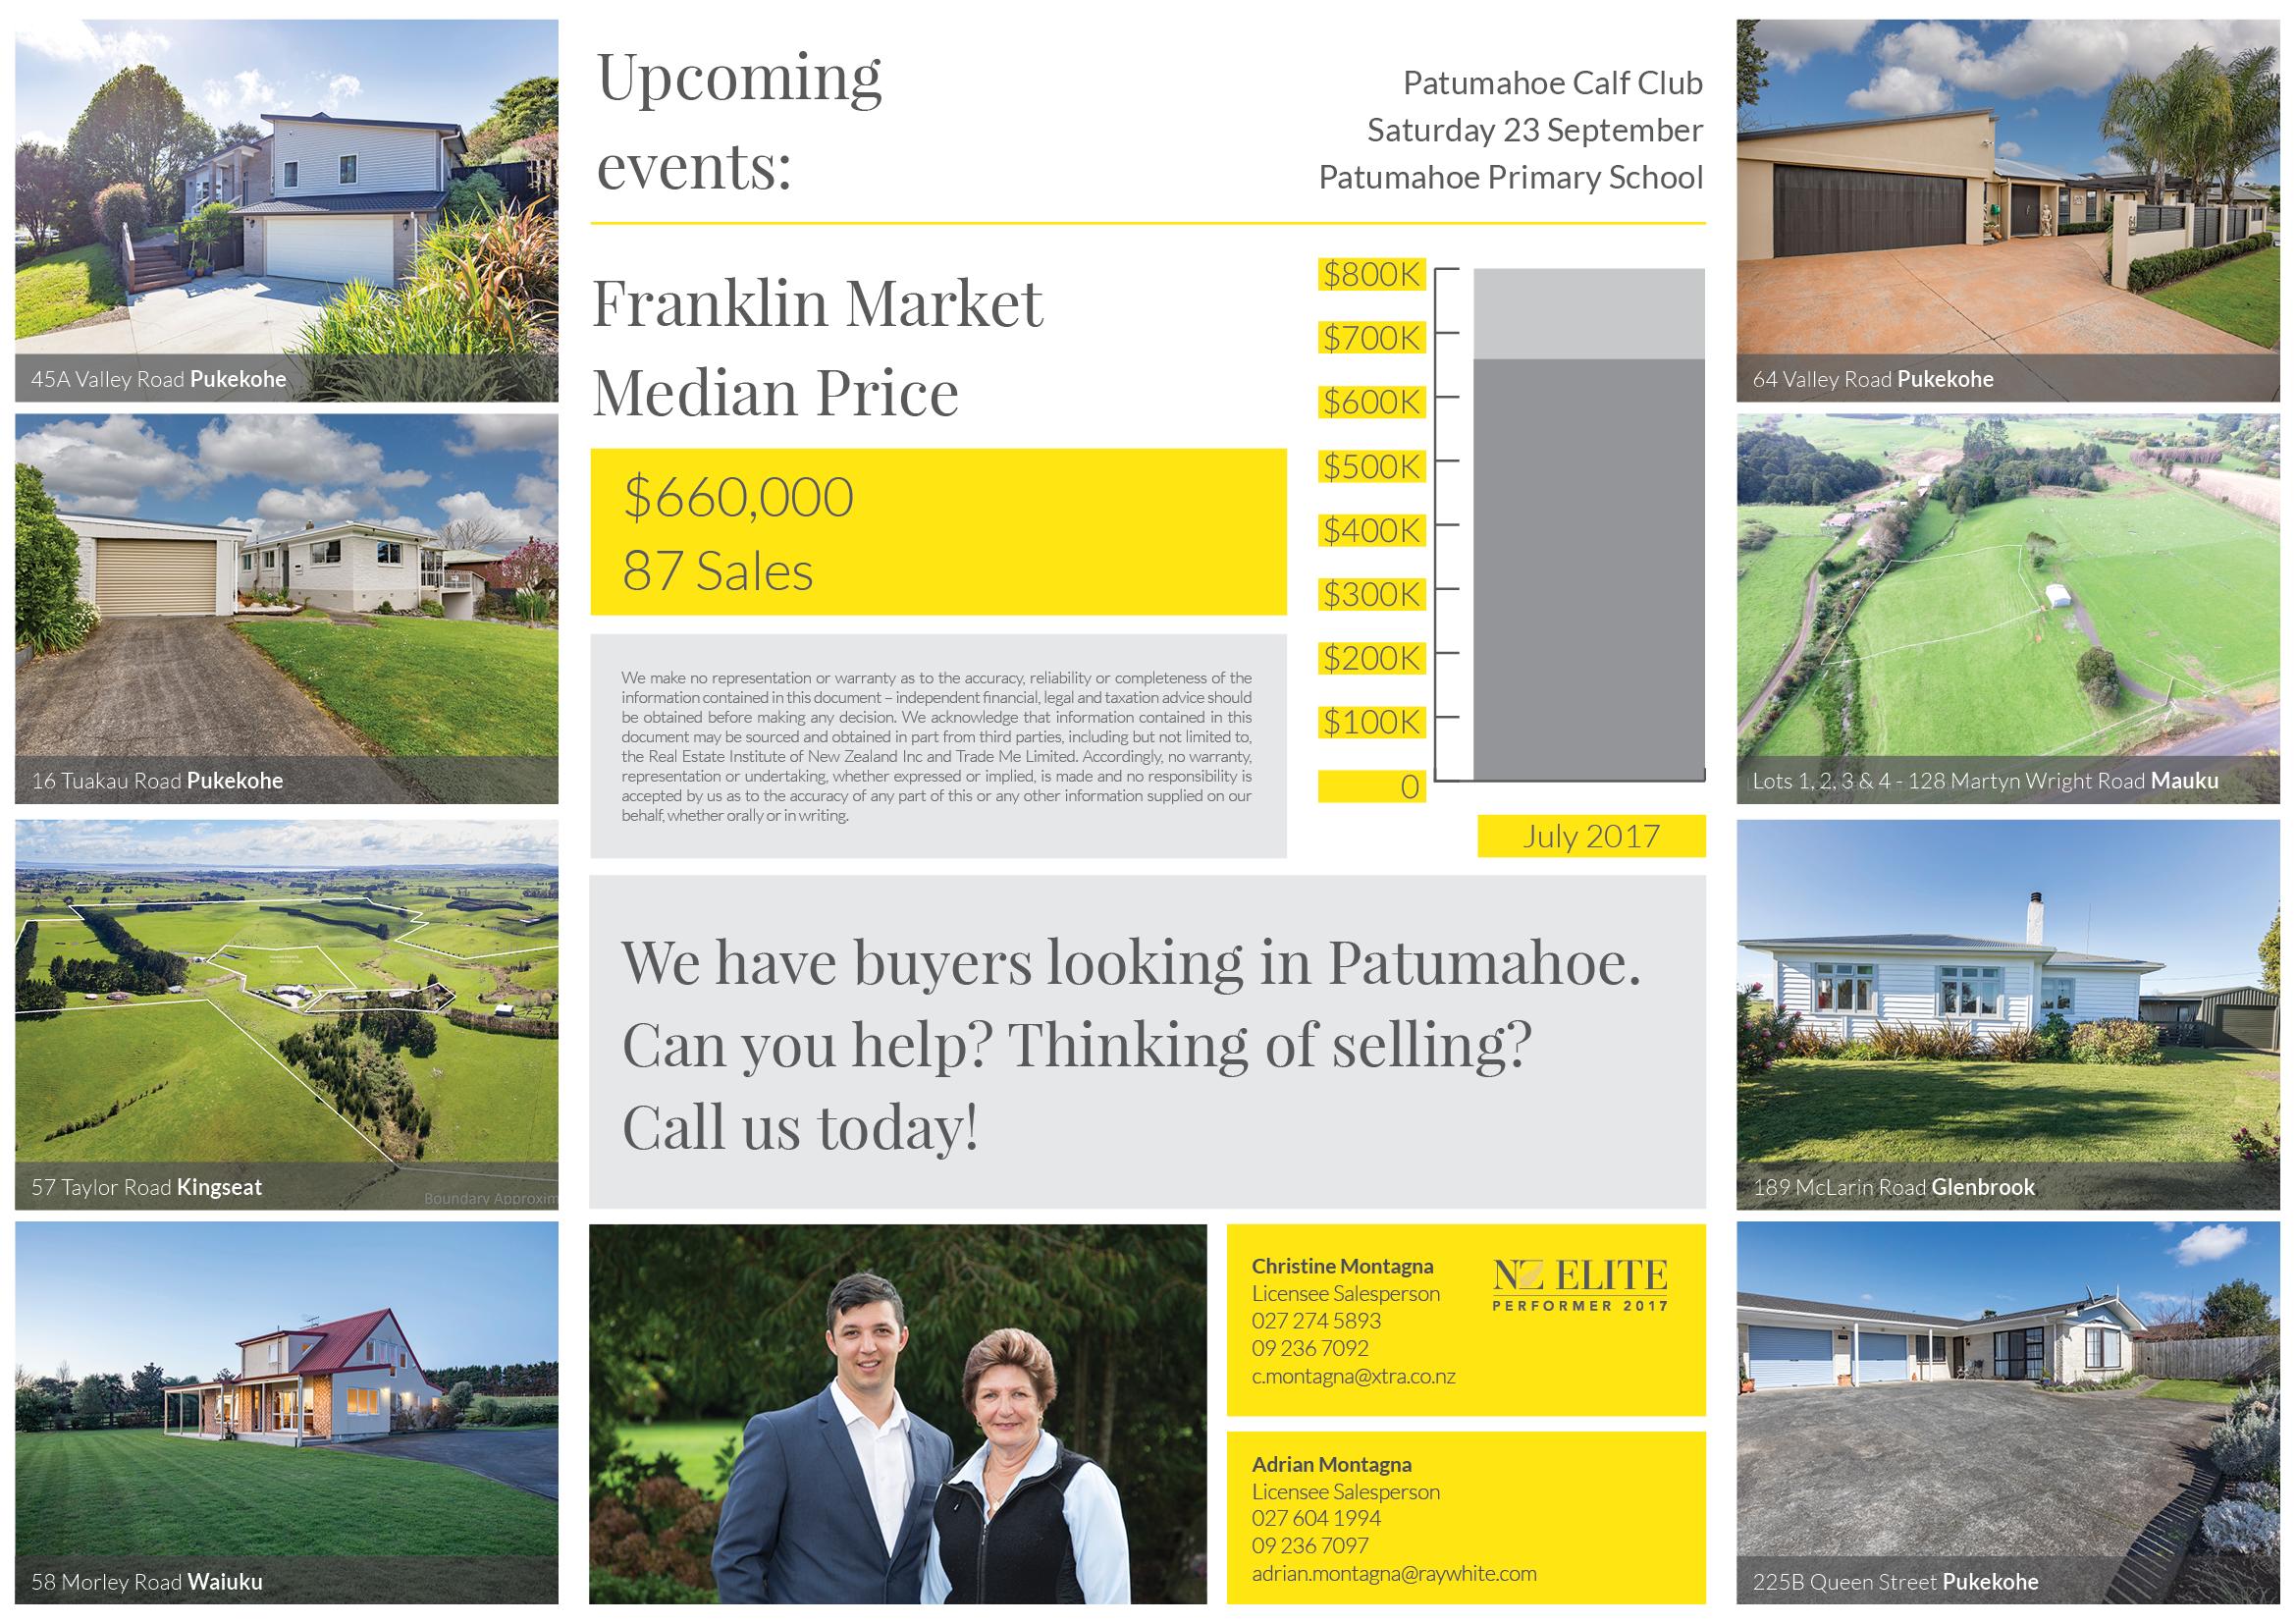 A4 Gatefold Community Newsletter Inside